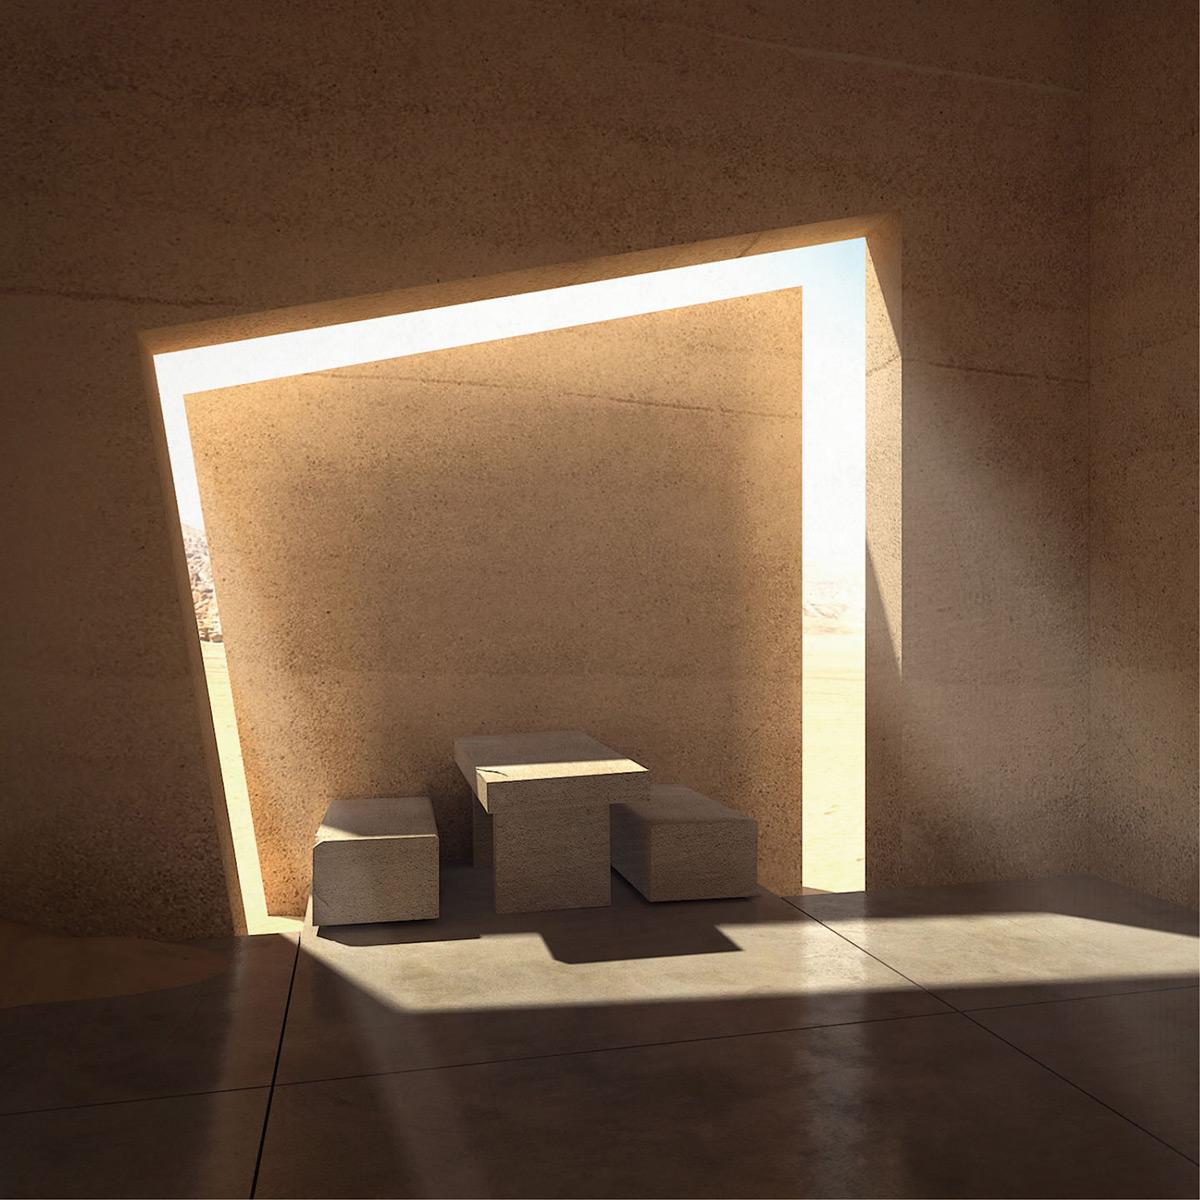 Sesame-Christophe-Benichou-Architecture-03